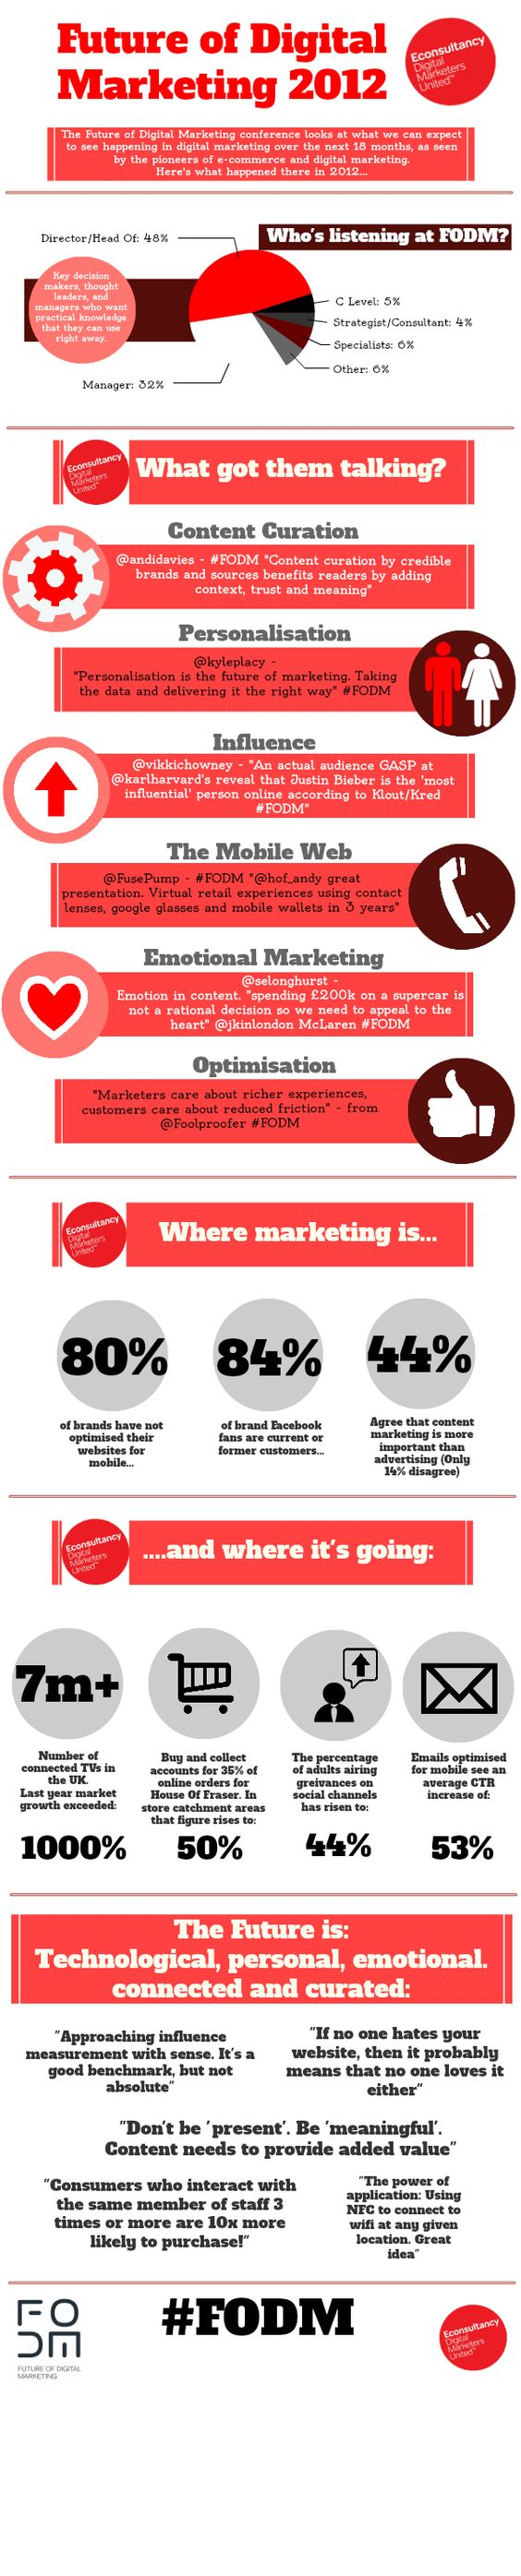 The Future of Digital Marketing via @eConsultancy